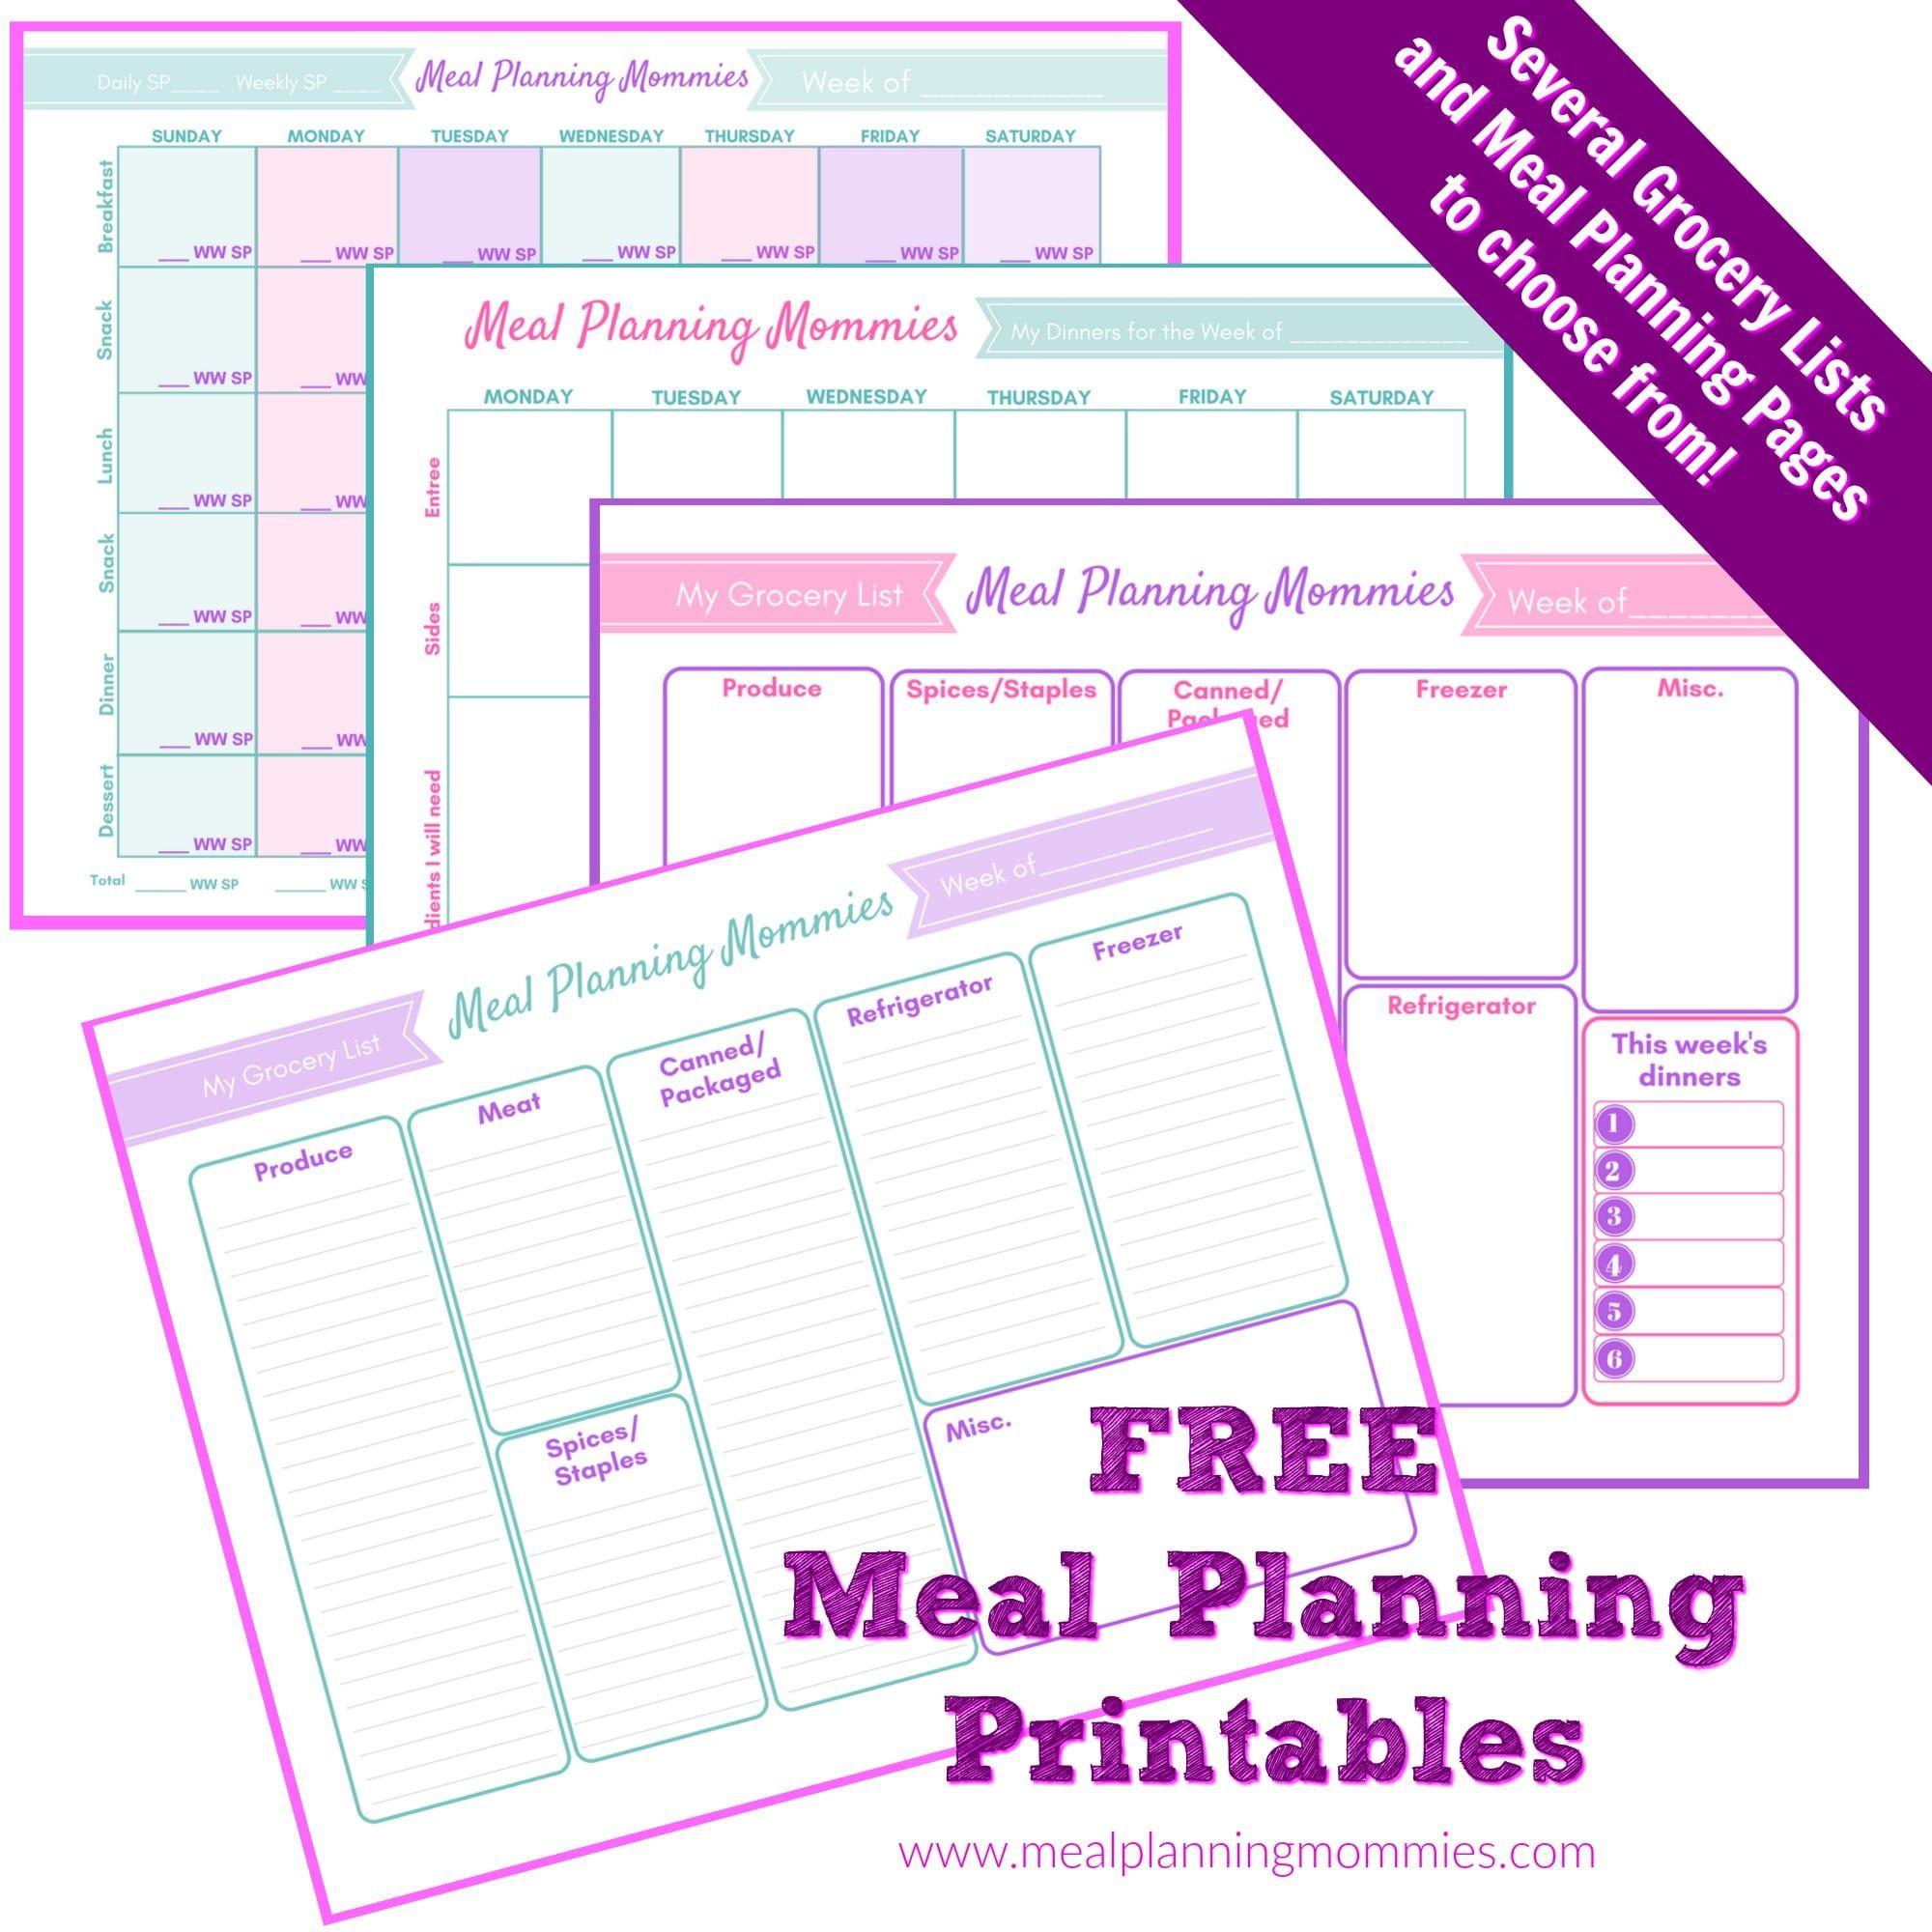 009 Imposing Diet Plan Format Pdf High Def Full